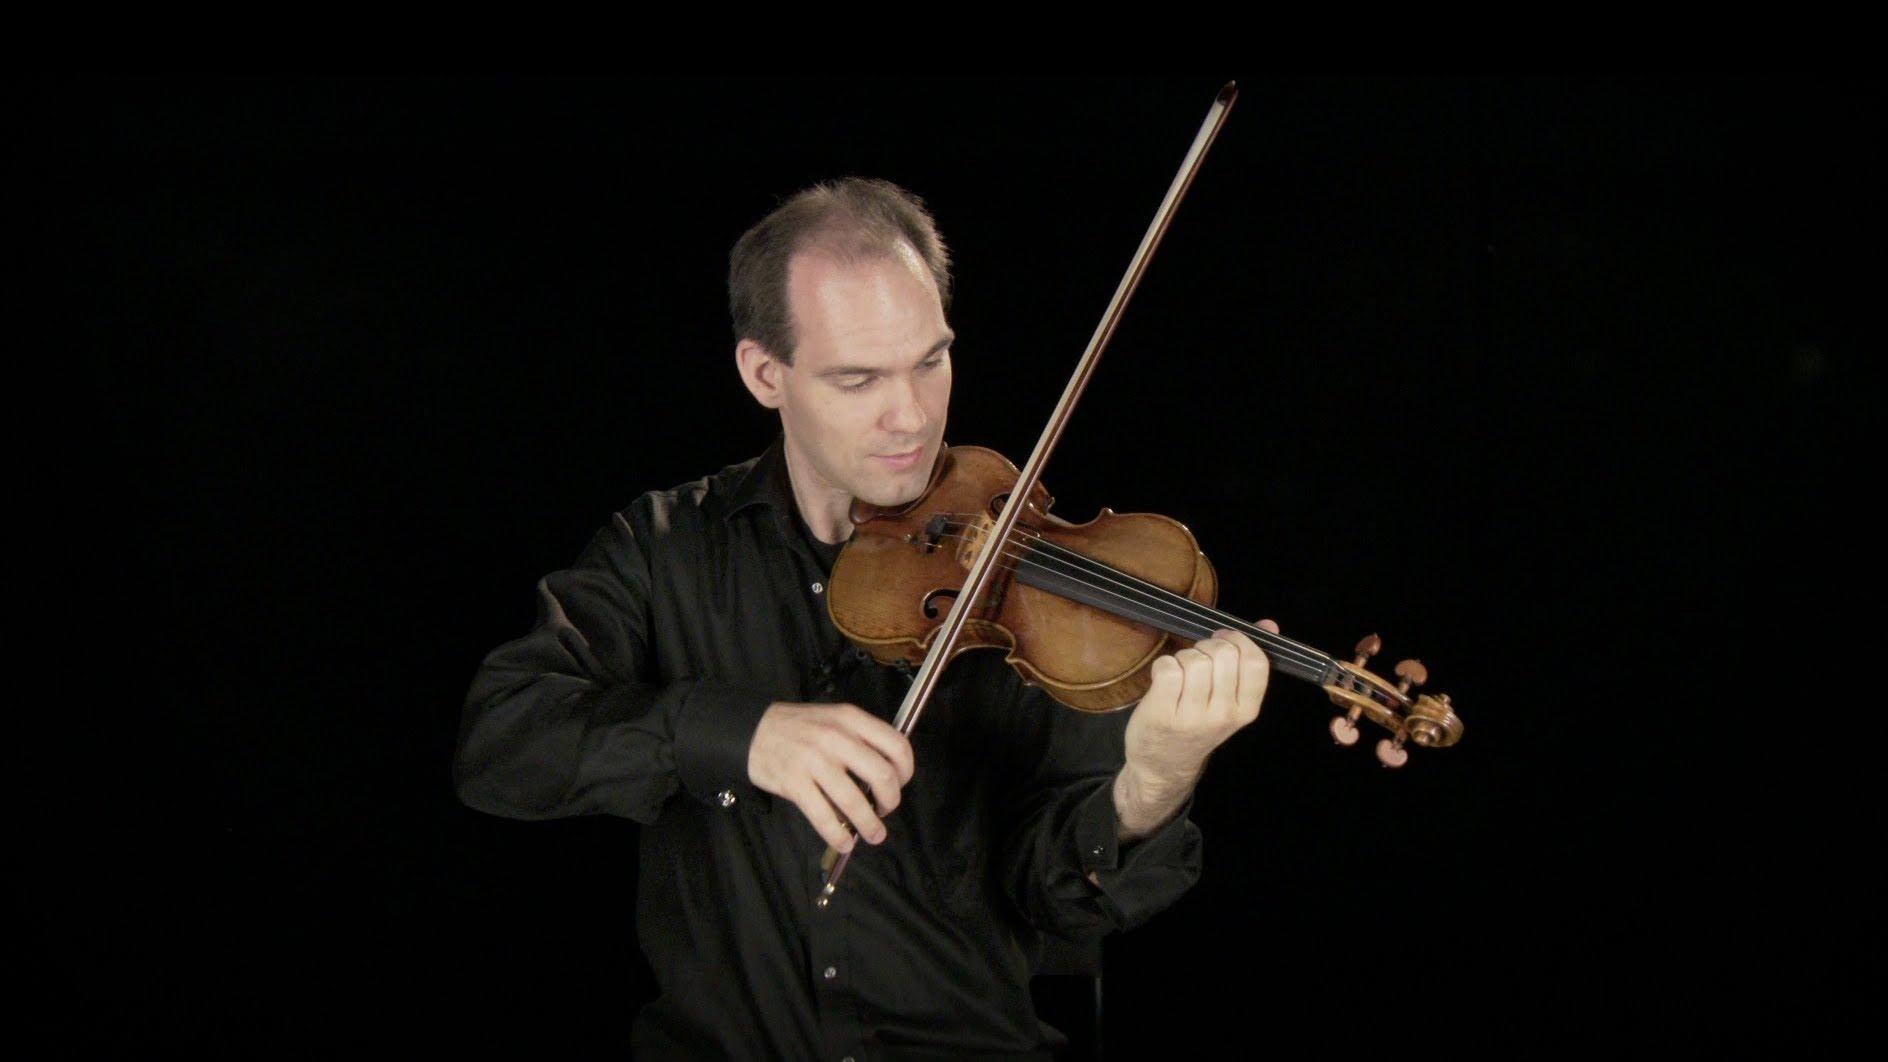 Instrument: Violin - YouTube